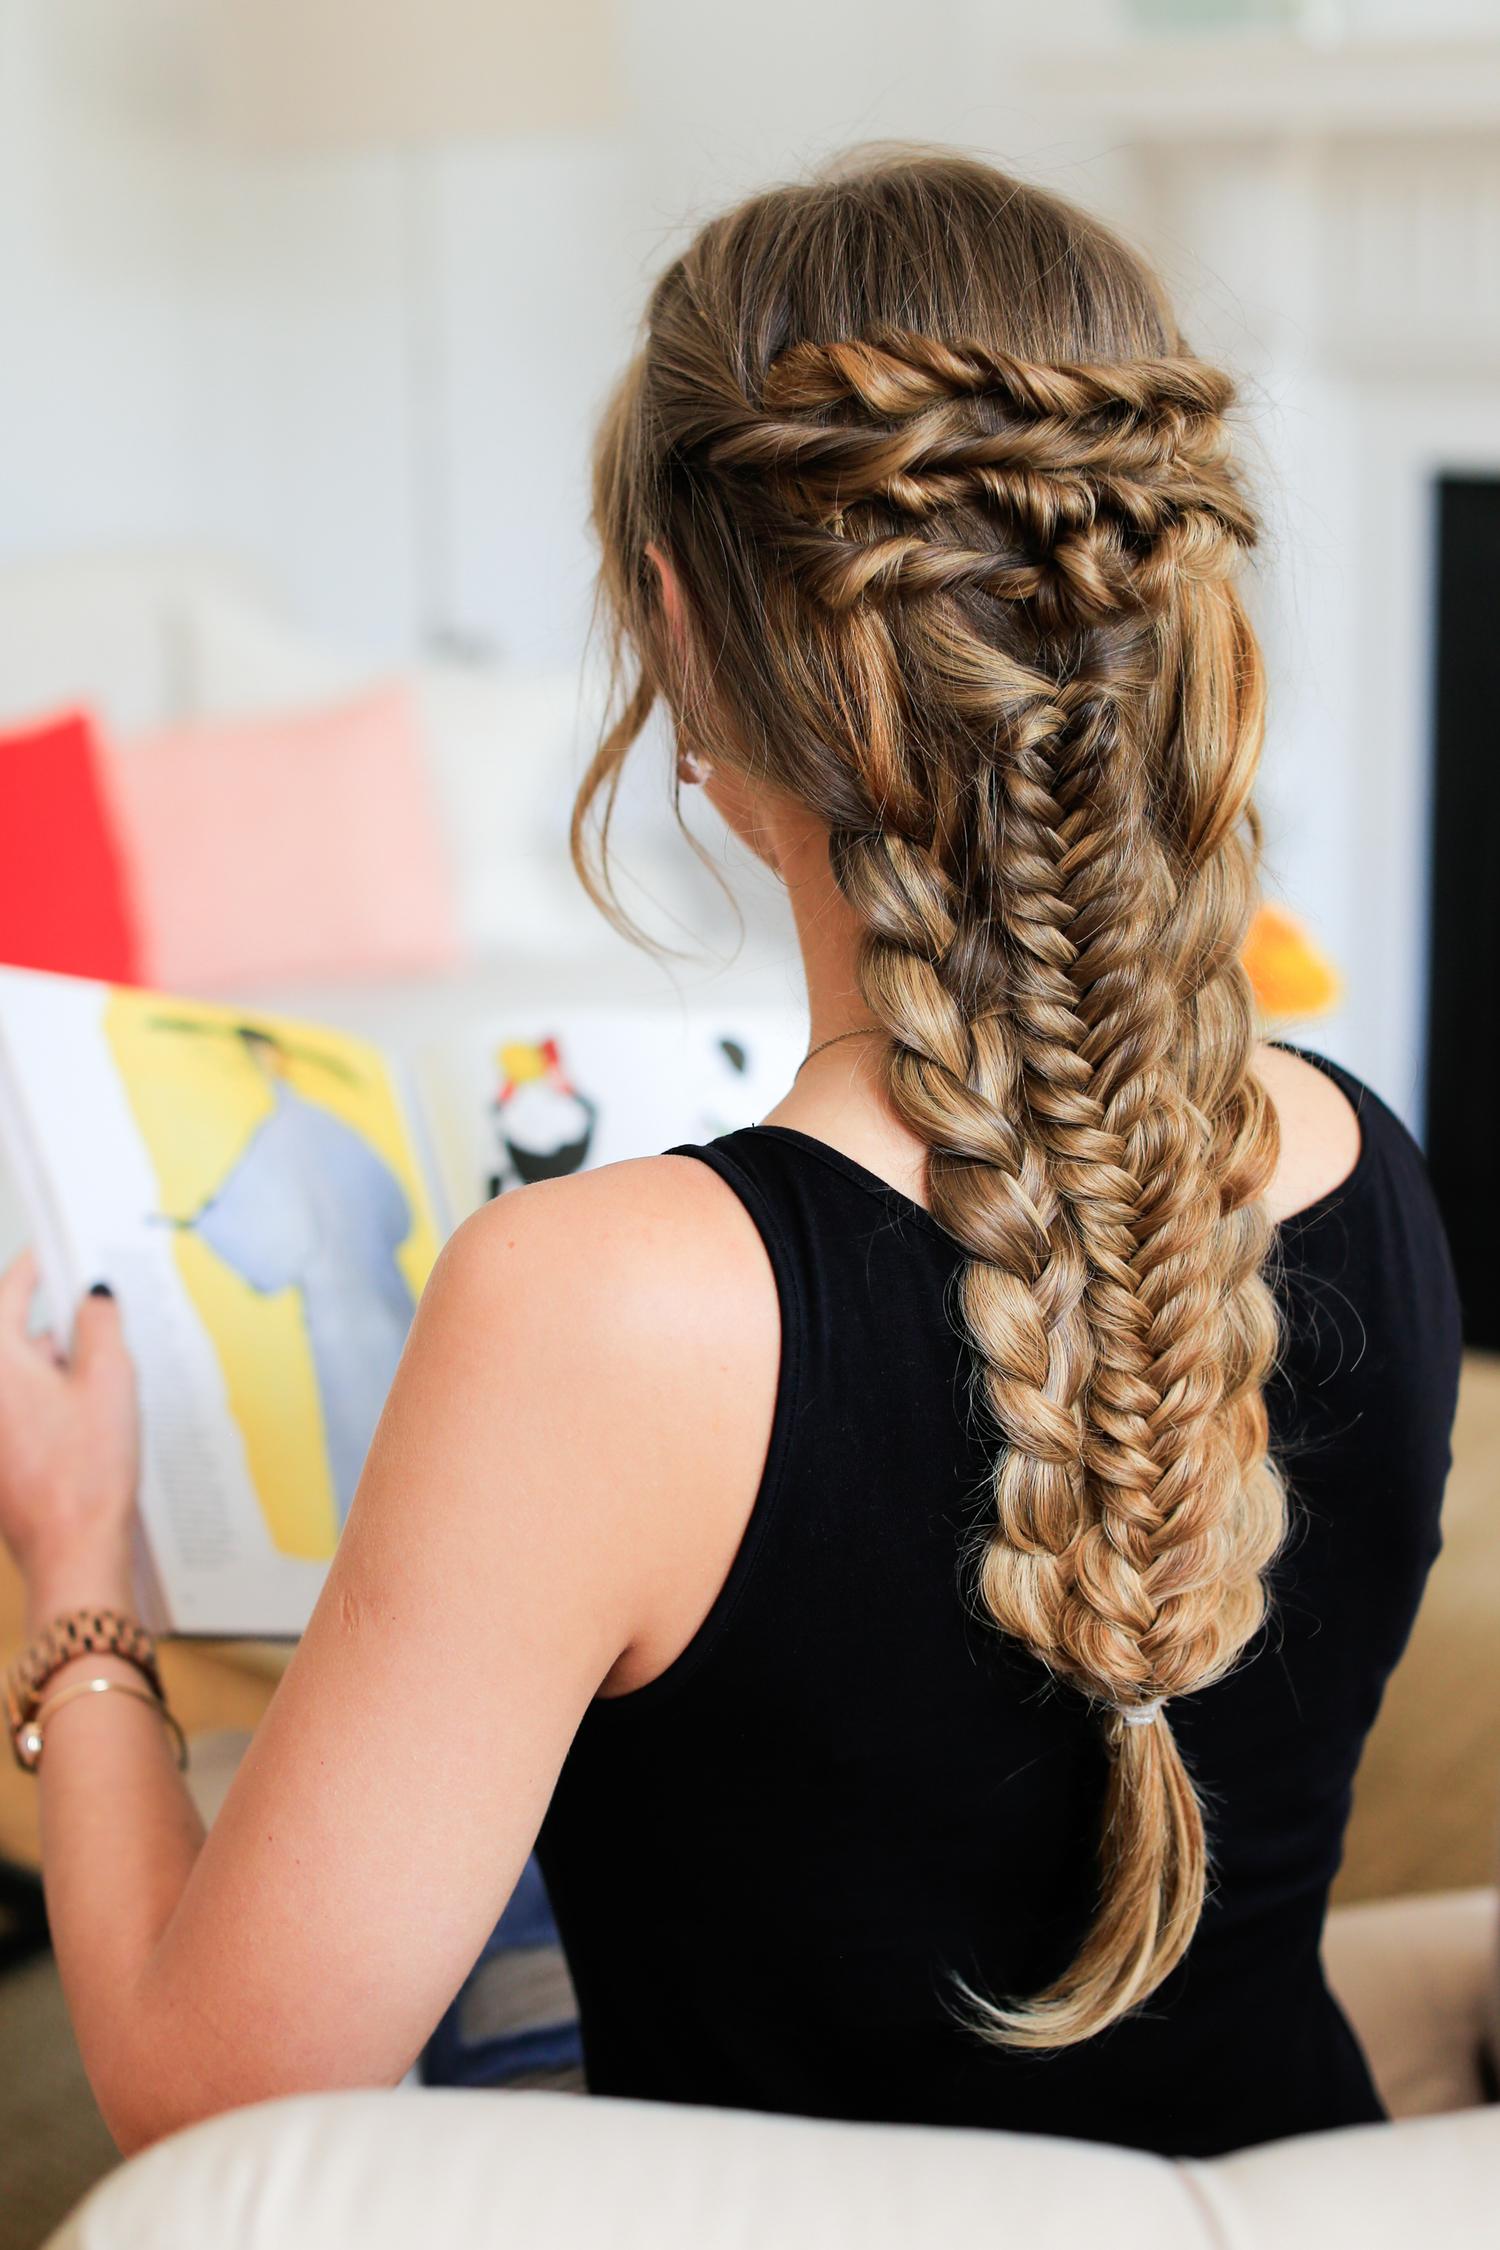 Layered Braid Hairstyle Tutorial Luxy Hair Blog All About Hair